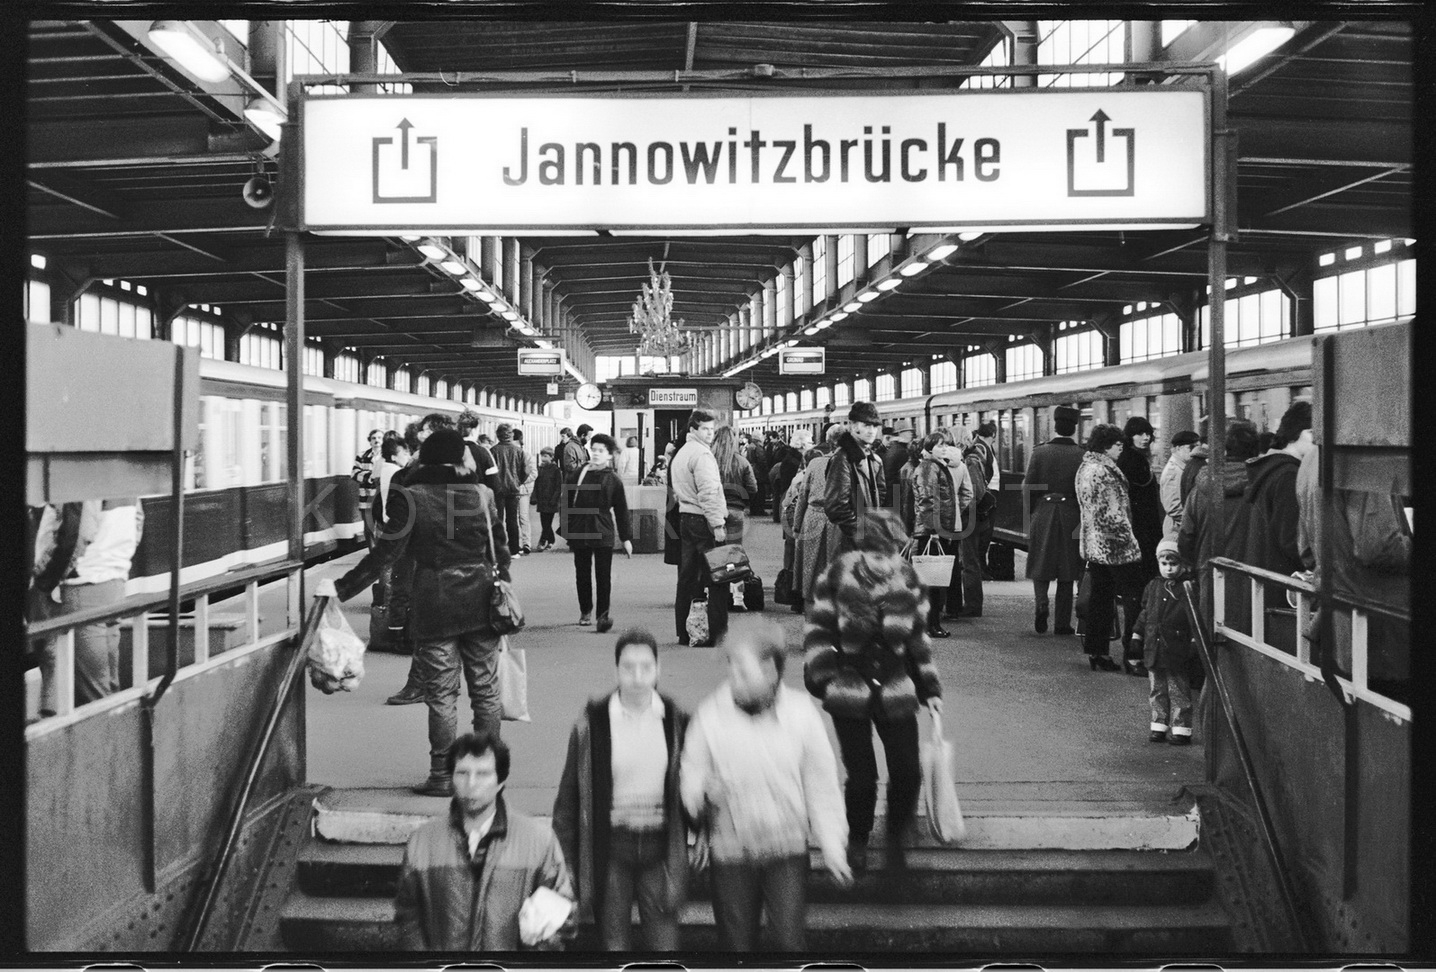 Nr01-044_Janowitzbrücke-7.12.1984